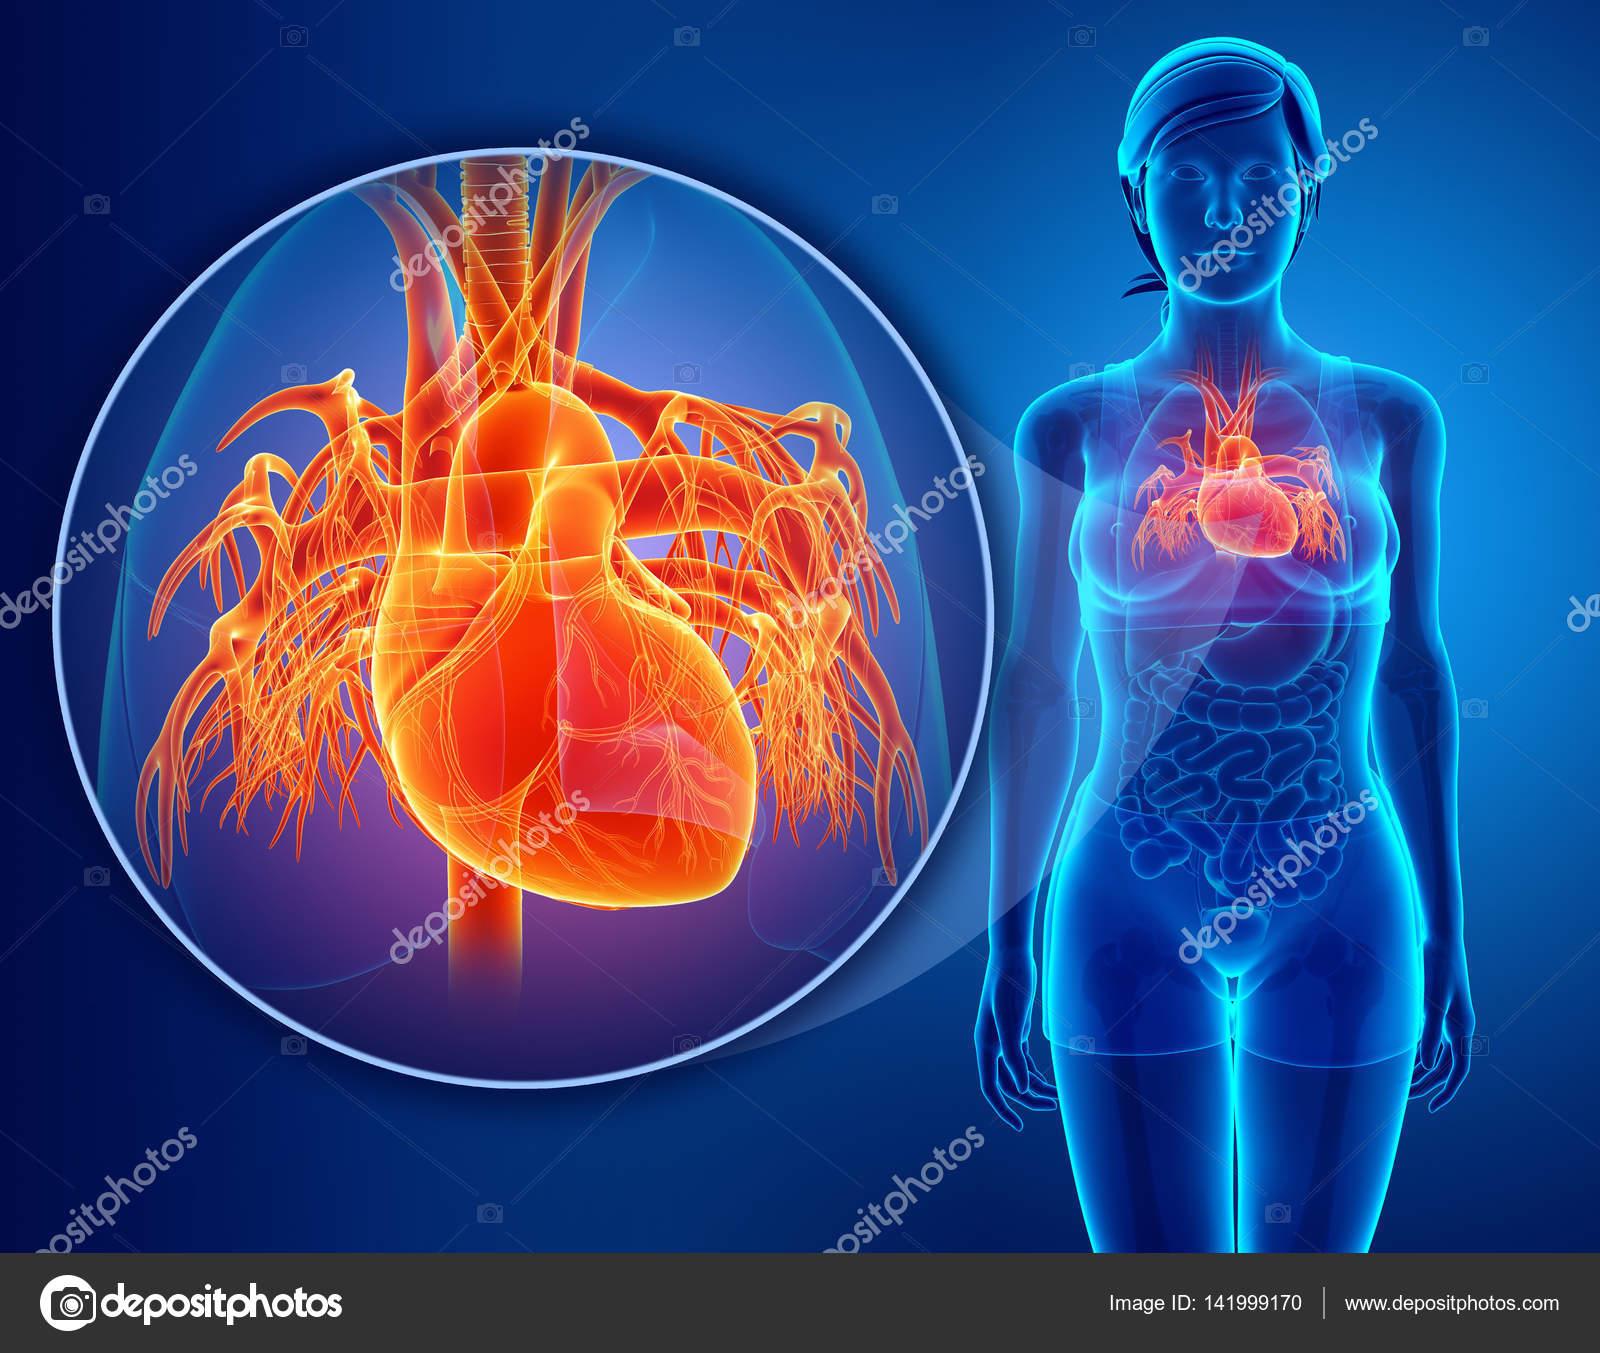 3d render of Human Heart Anatomy — Stock Photo © pixdesign123 #141999170